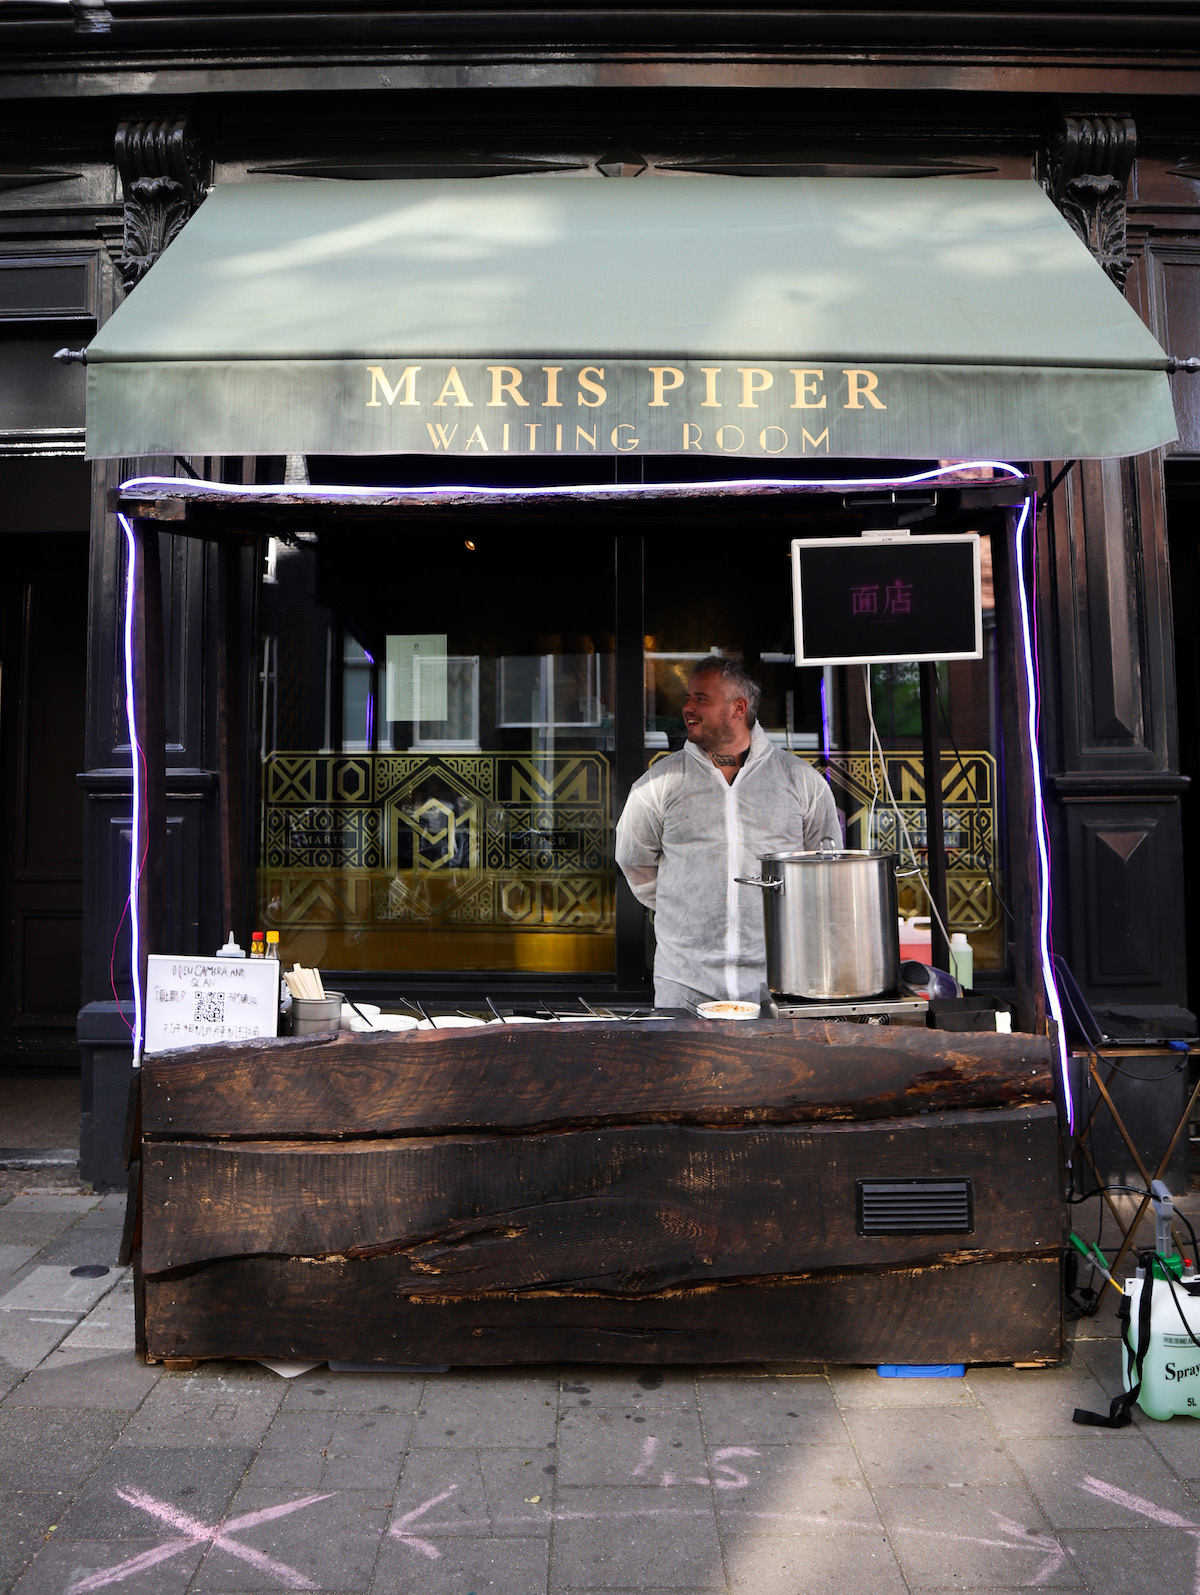 Food court Maris Piper